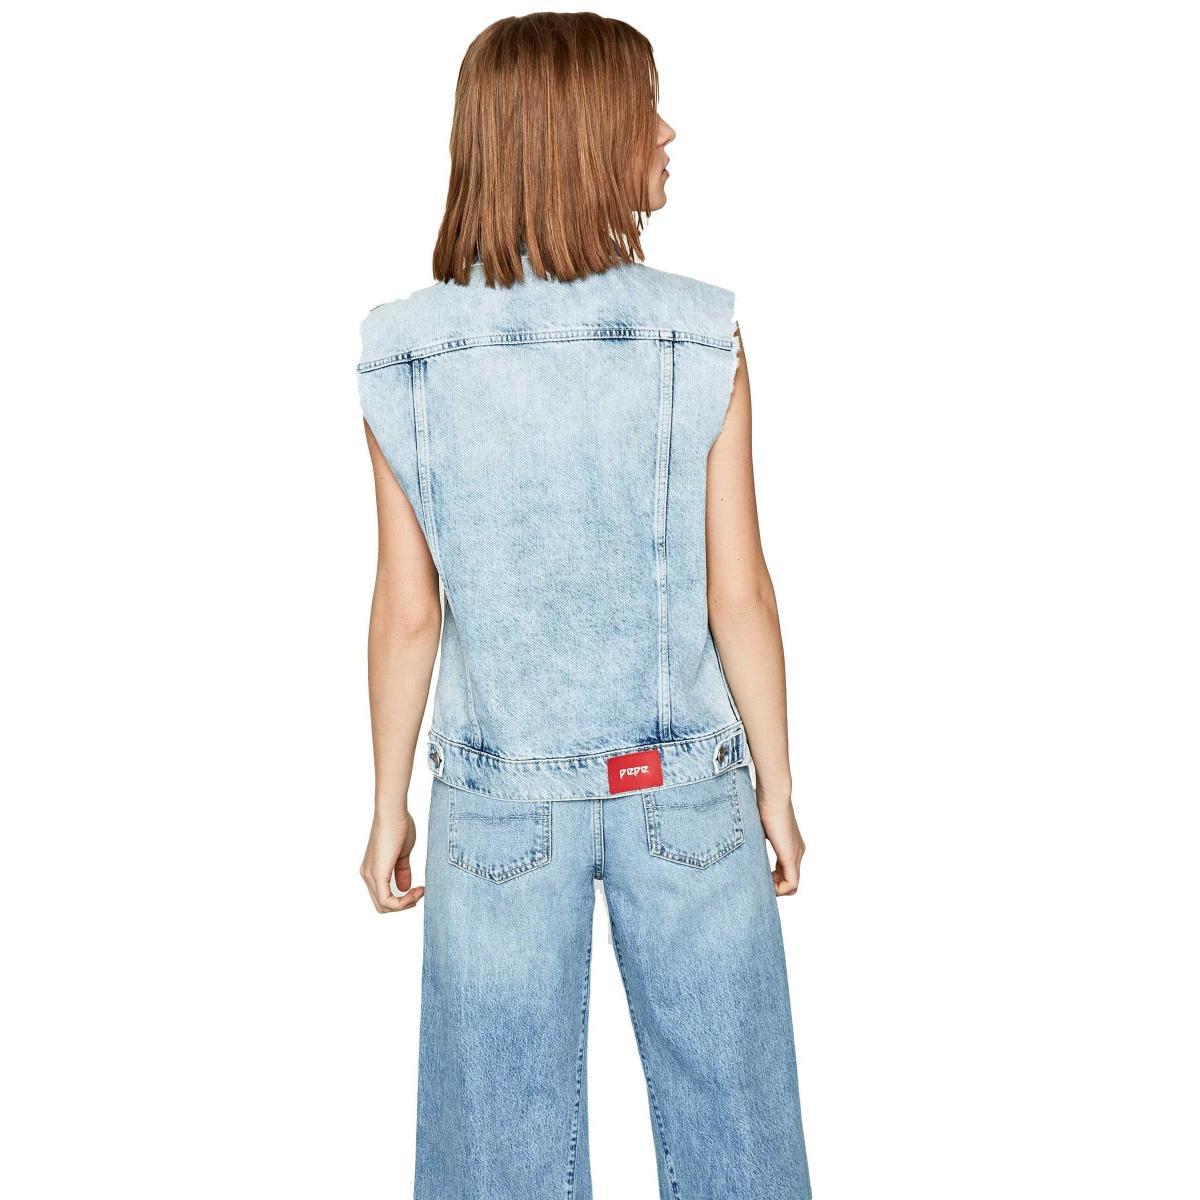 Smanicato Gilet Pepe Jeans vintage in jeans Maria da donna rif. PL401664